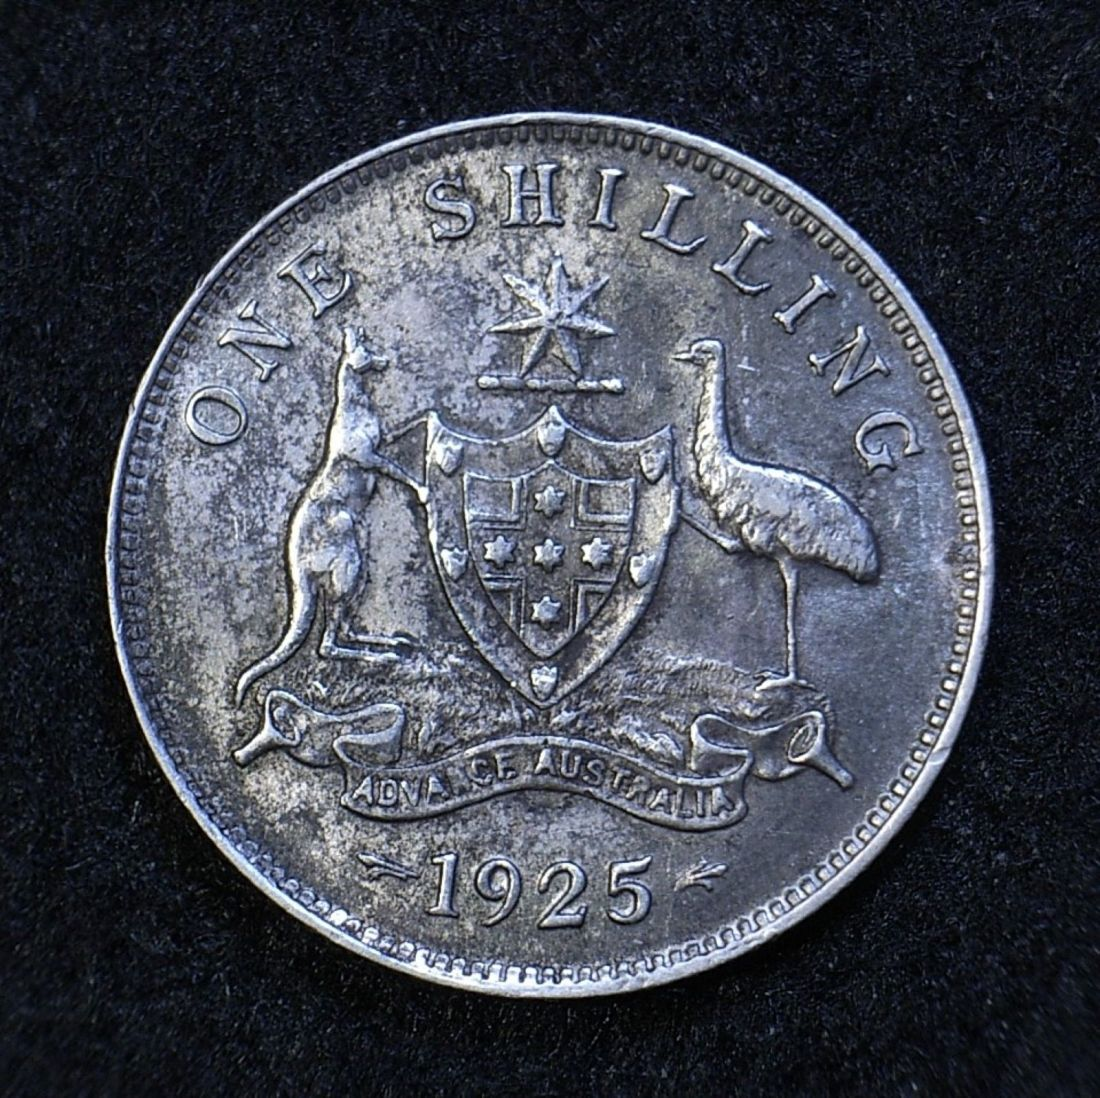 Close up Aus Shilling 1925 reverse